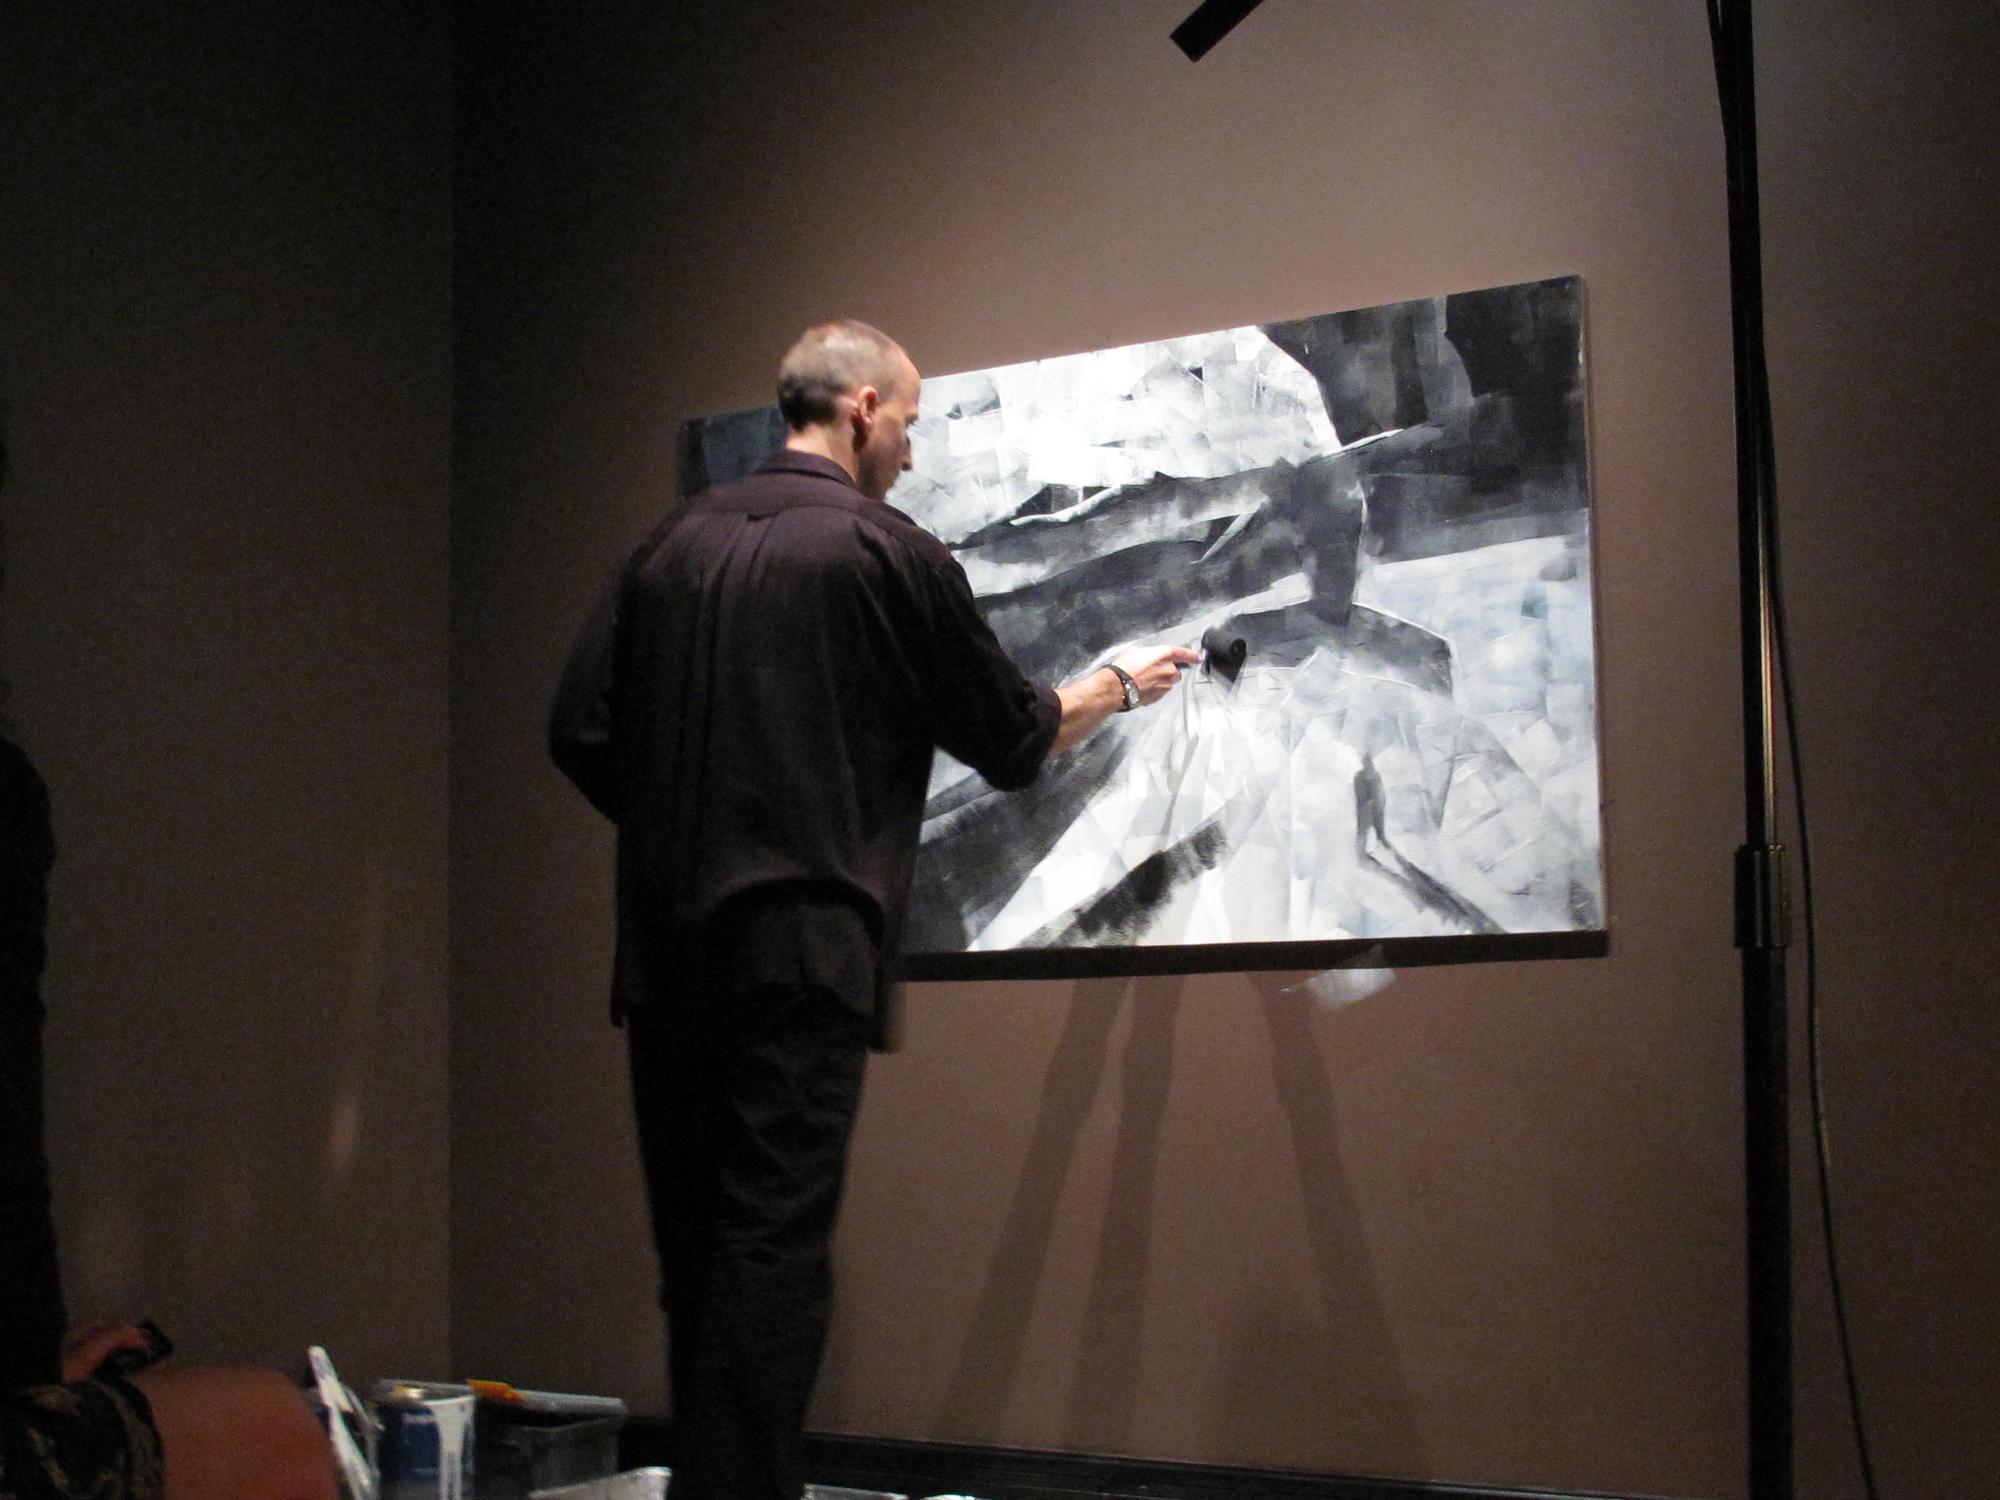 Danijel Žeželj, Once, a live painting and music performance, 2010.